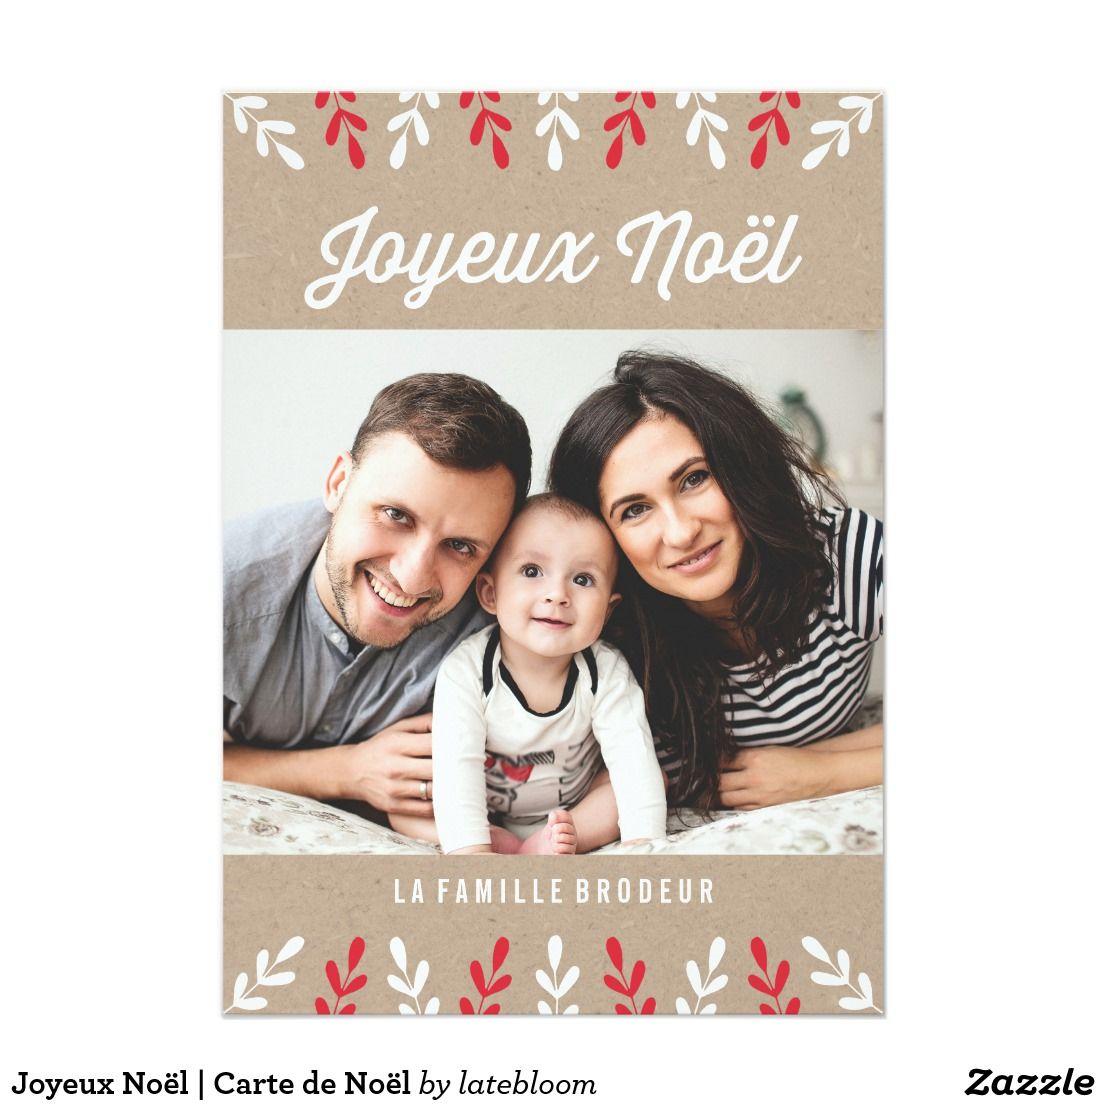 Joyeux Noël Carte De Noël Holiday Card Zazzlecom Holiday